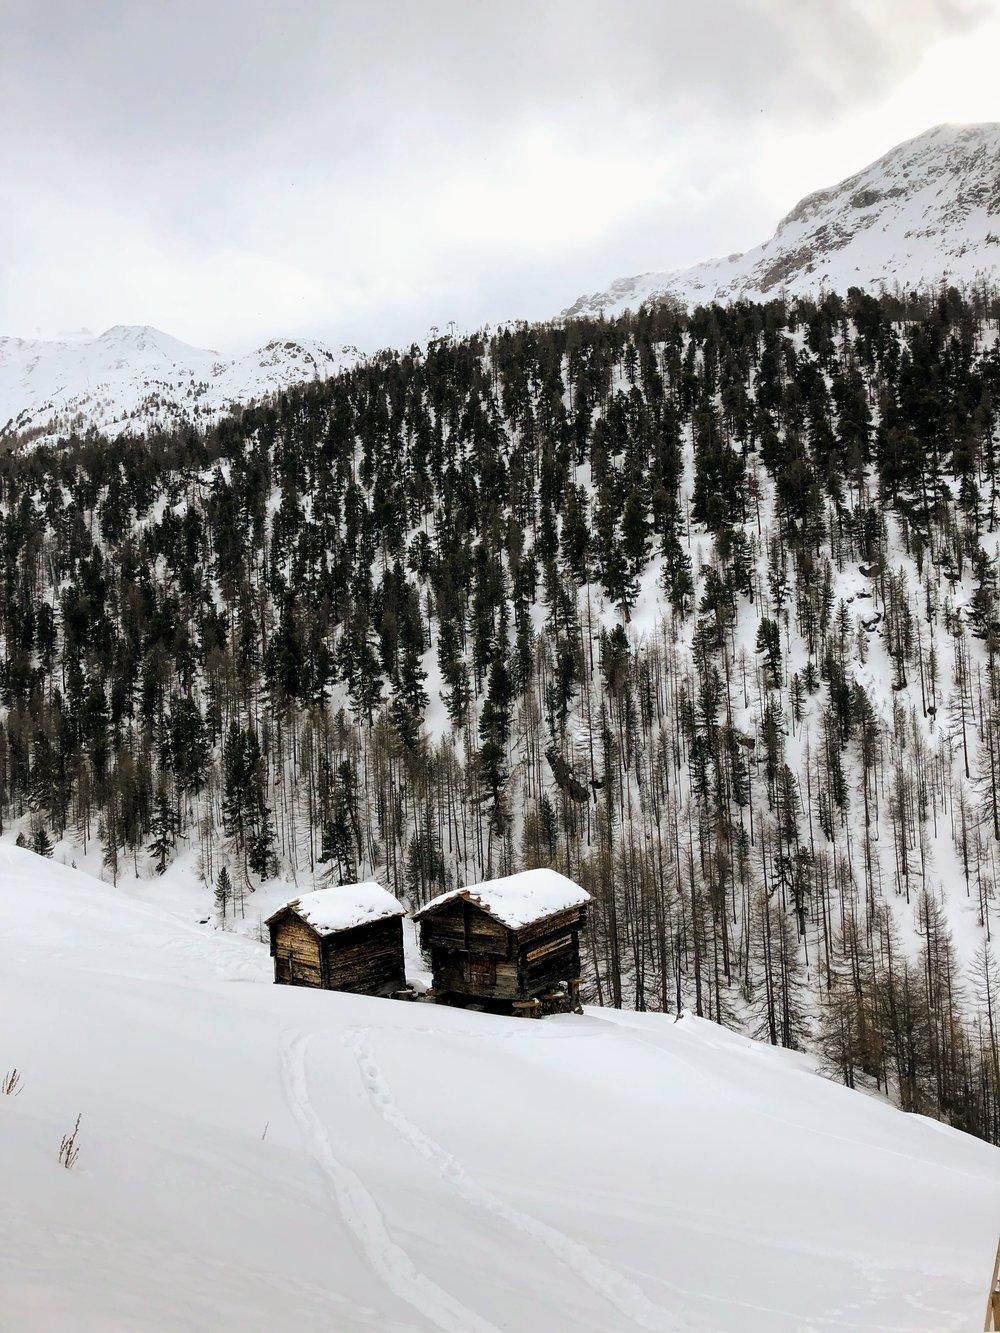 The little hamlet of Findeln